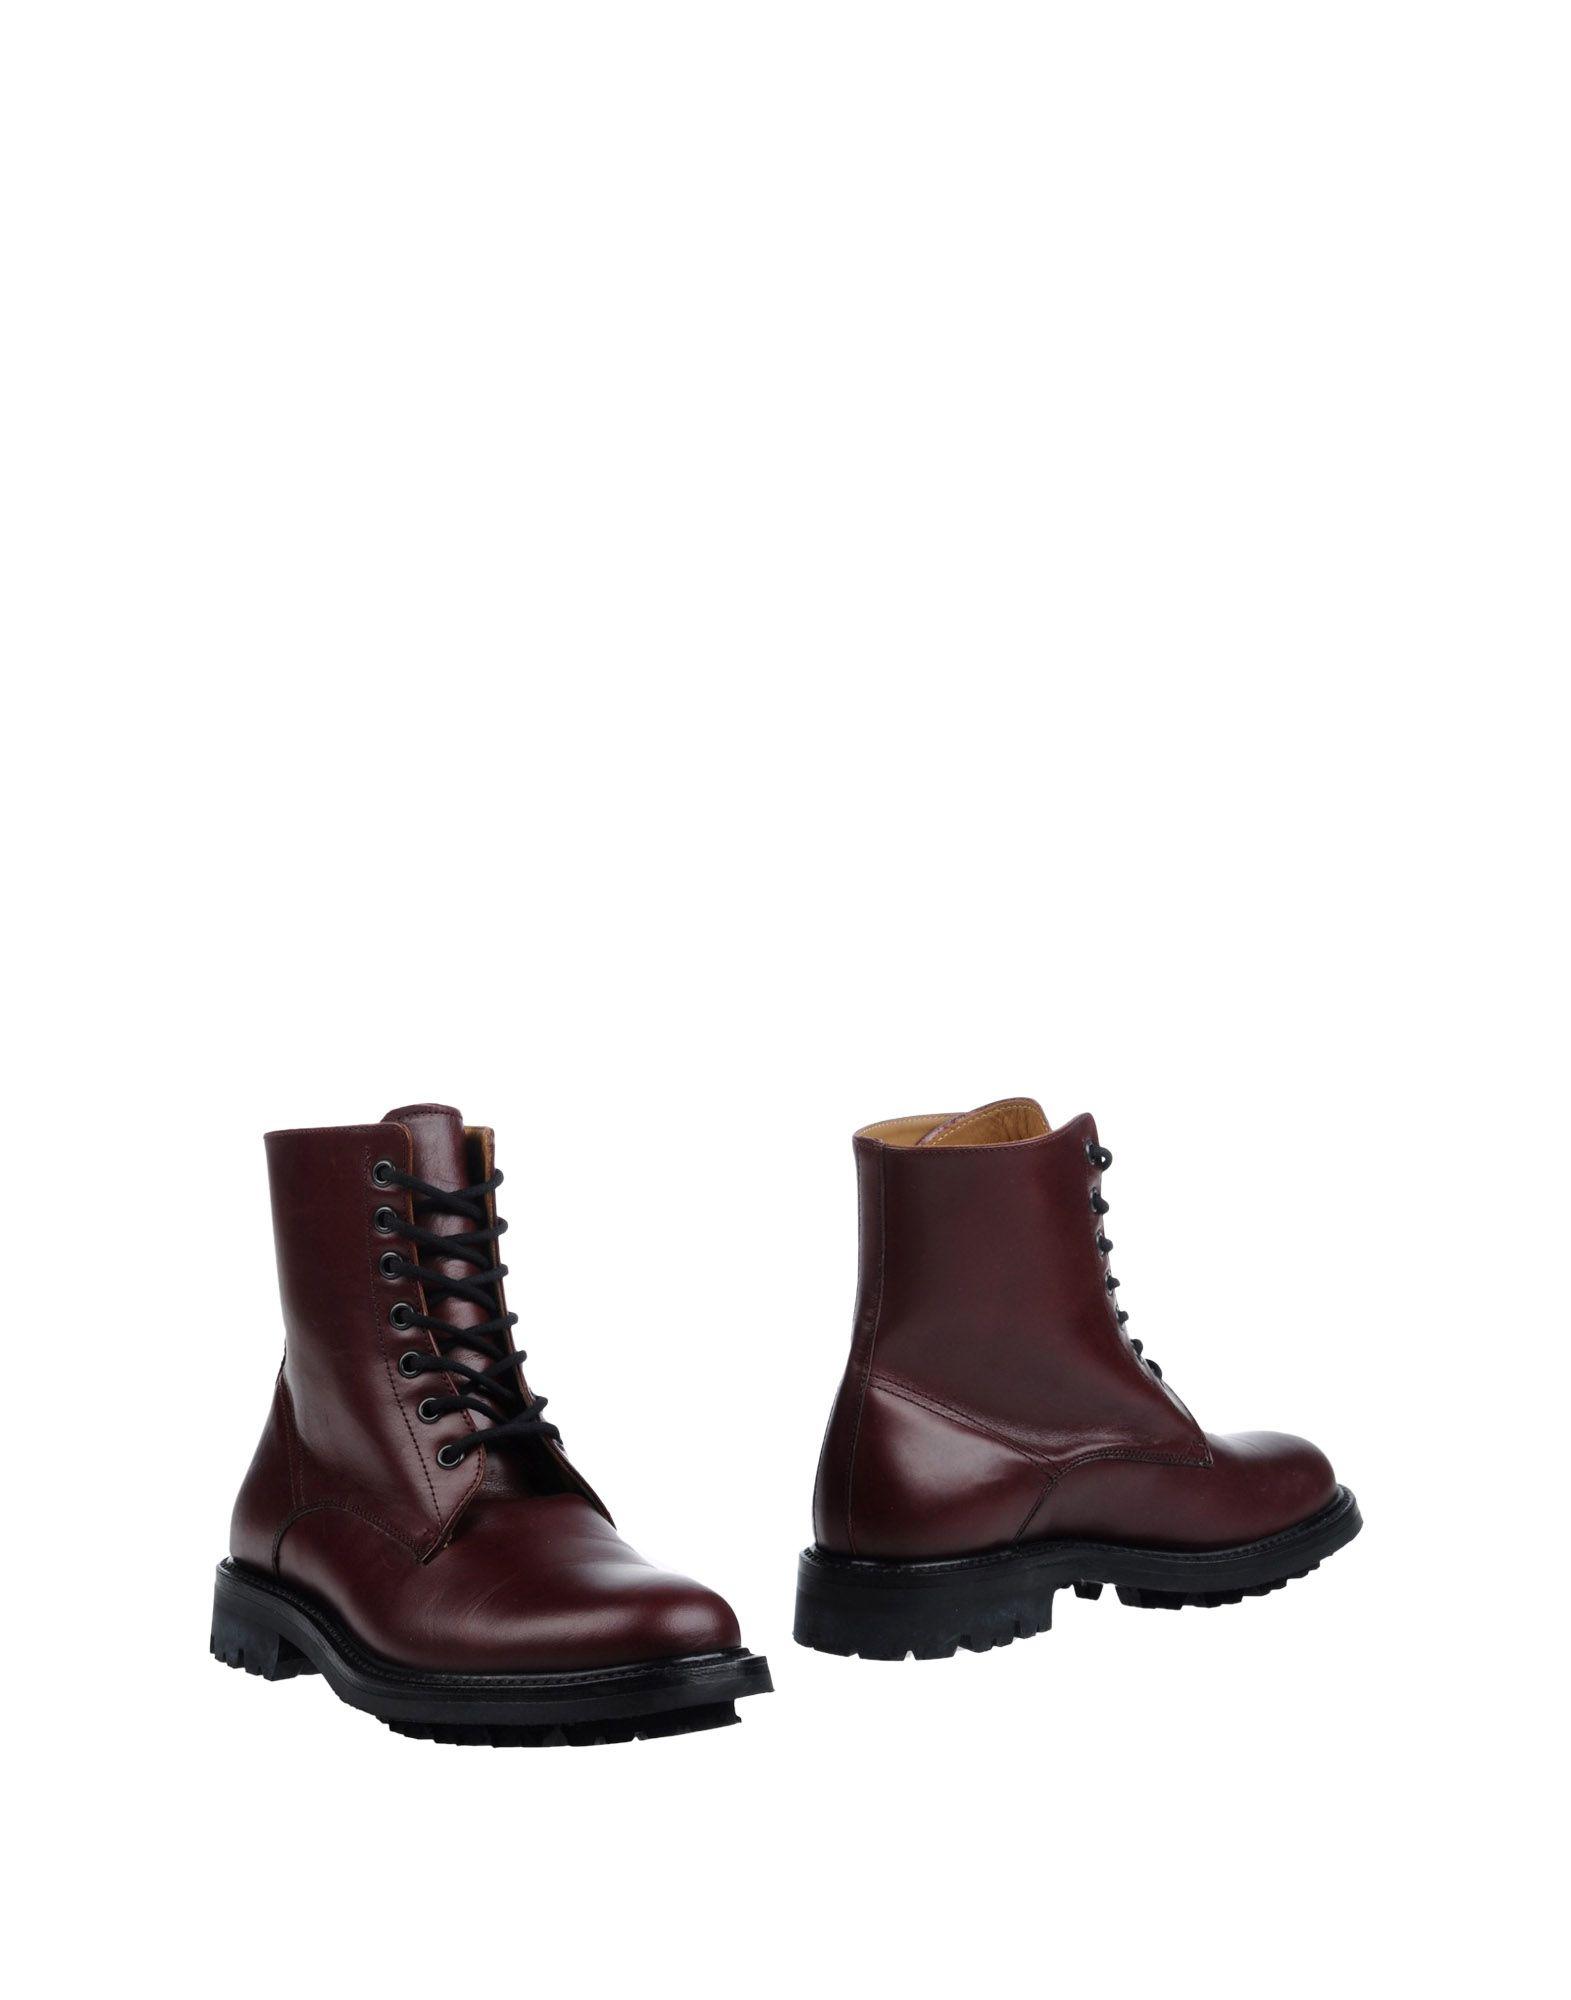 ARANTH Полусапоги и высокие ботинки magazzini del sale полусапоги и высокие ботинки